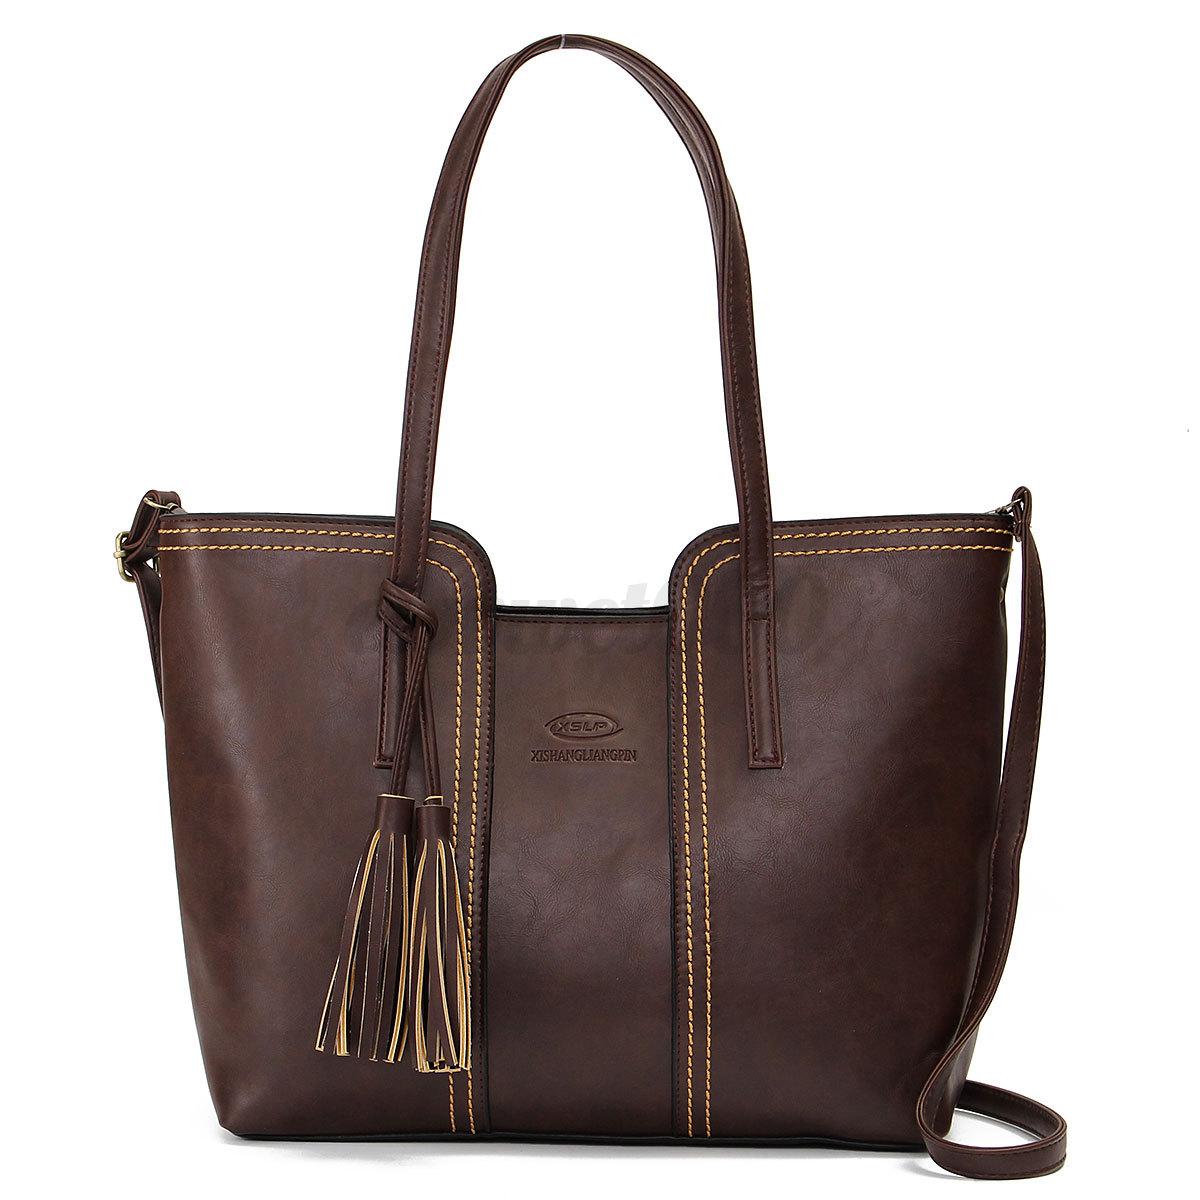 New Women Ladies Handbag Shoulder Bag Tote Purse Leather Women Messenger Bags